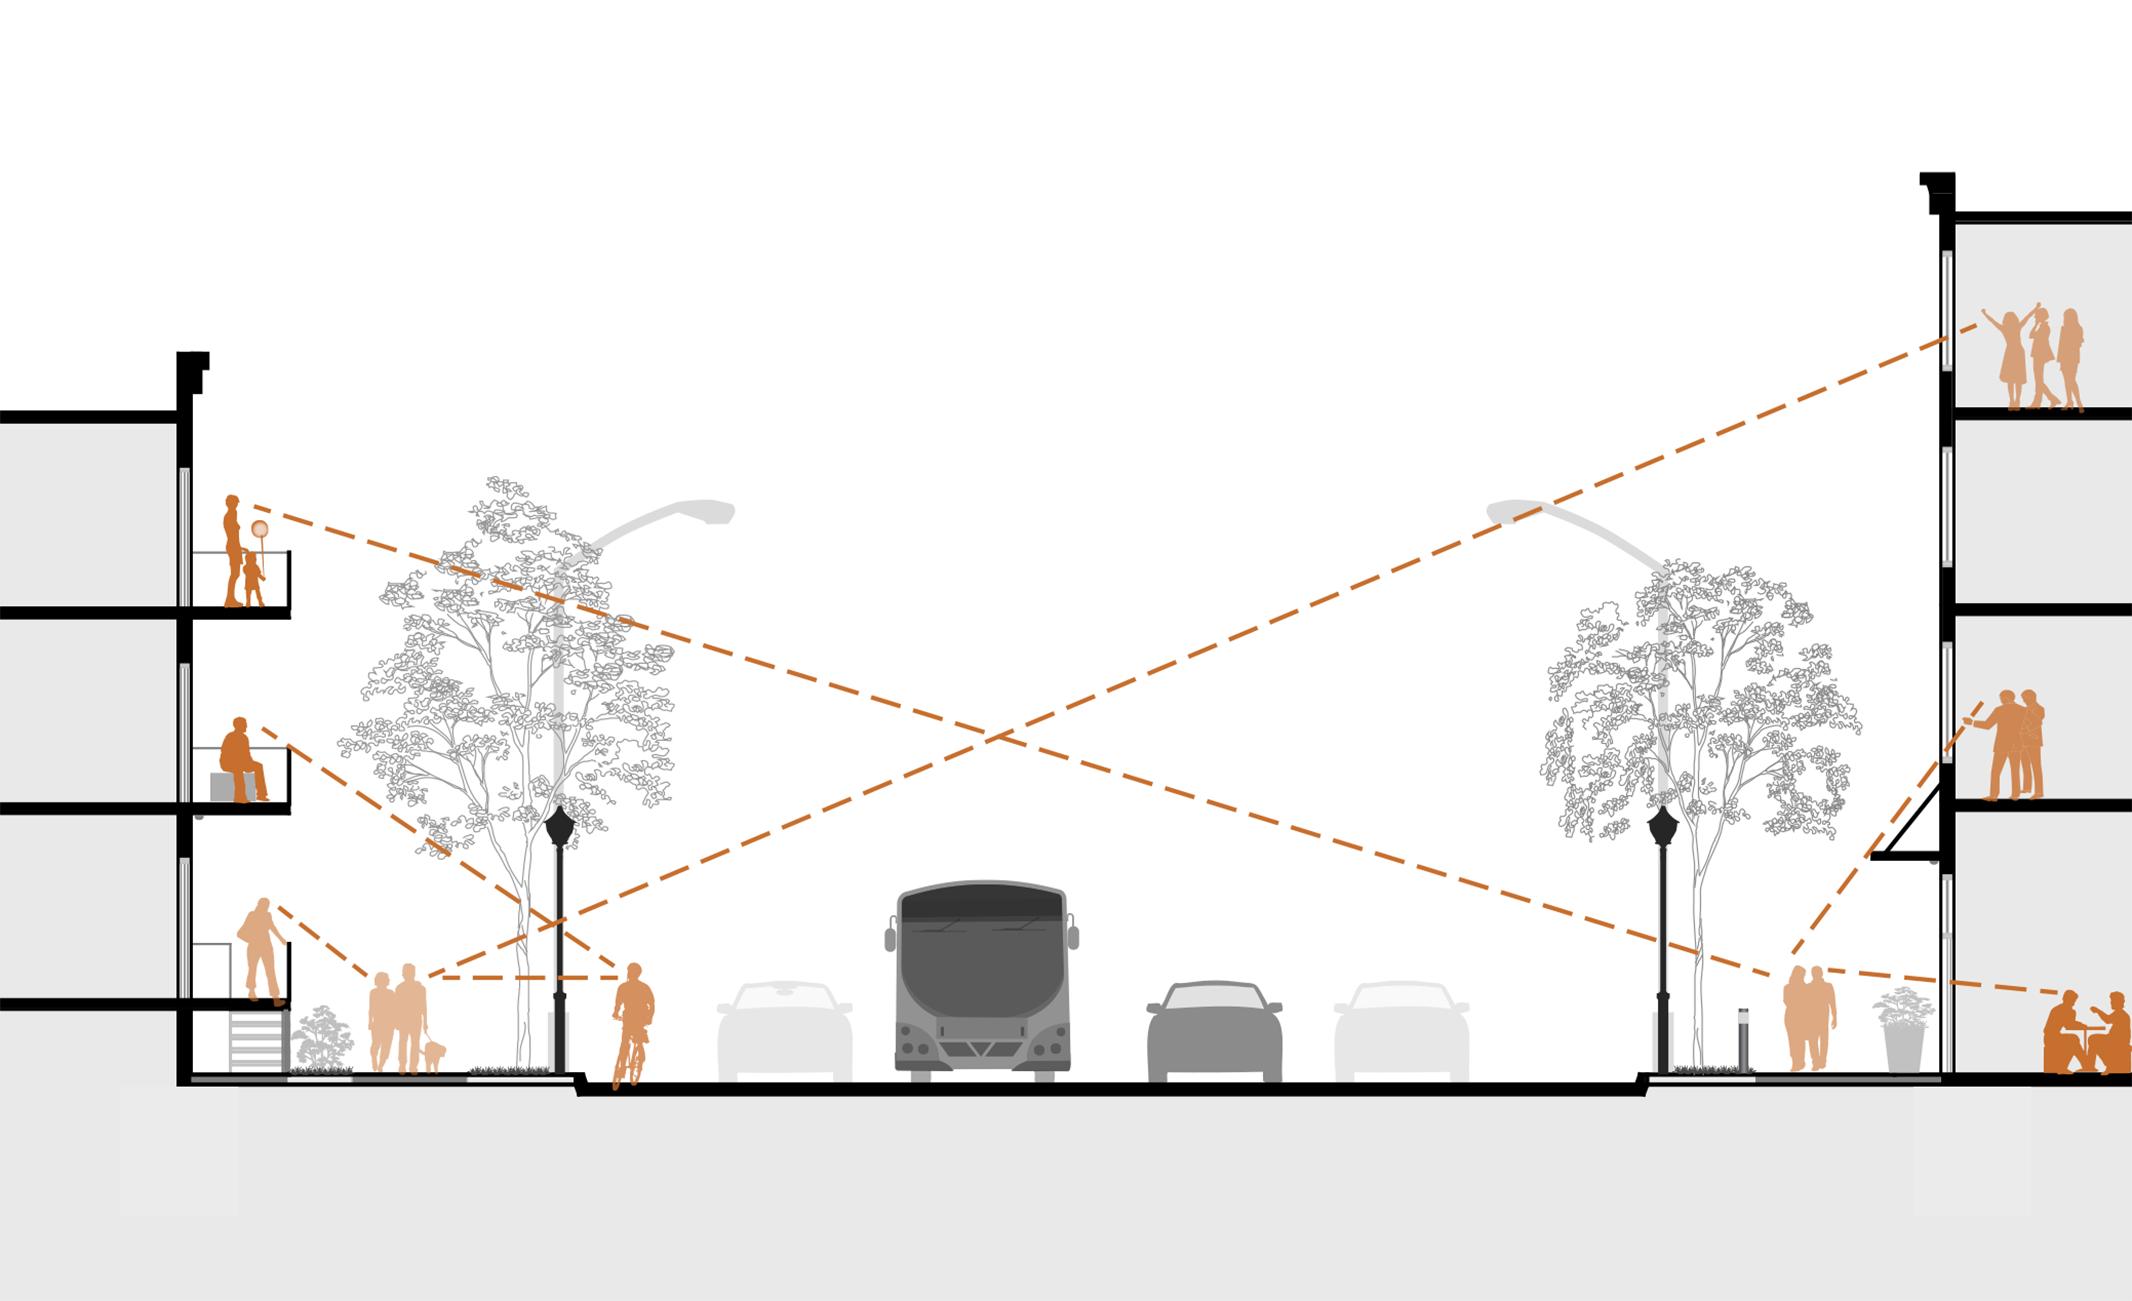 illustration of natural surveillance